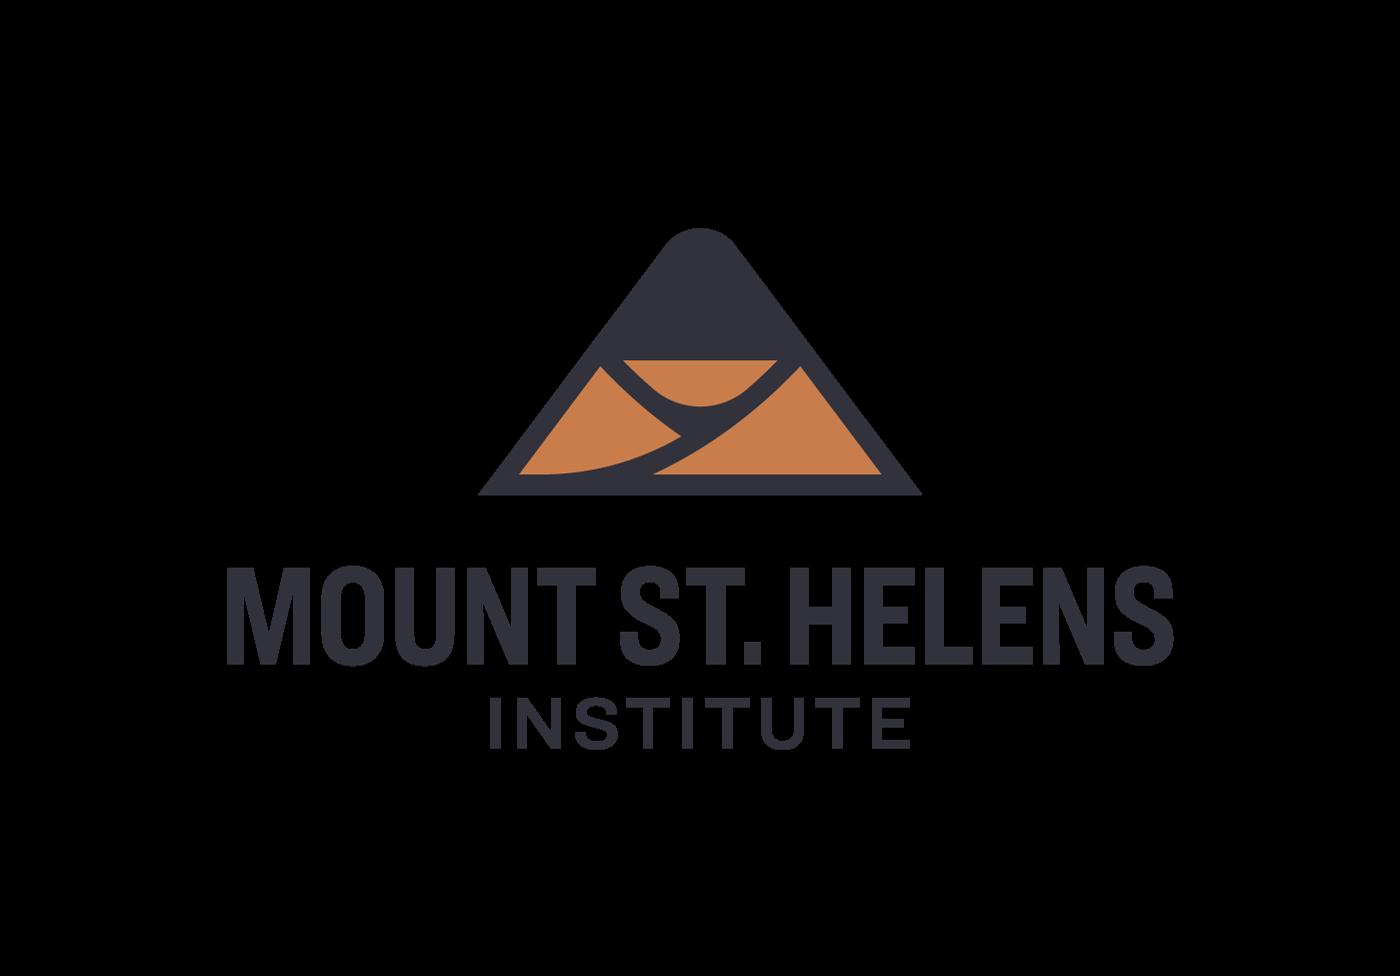 Mount St. Helens Institute